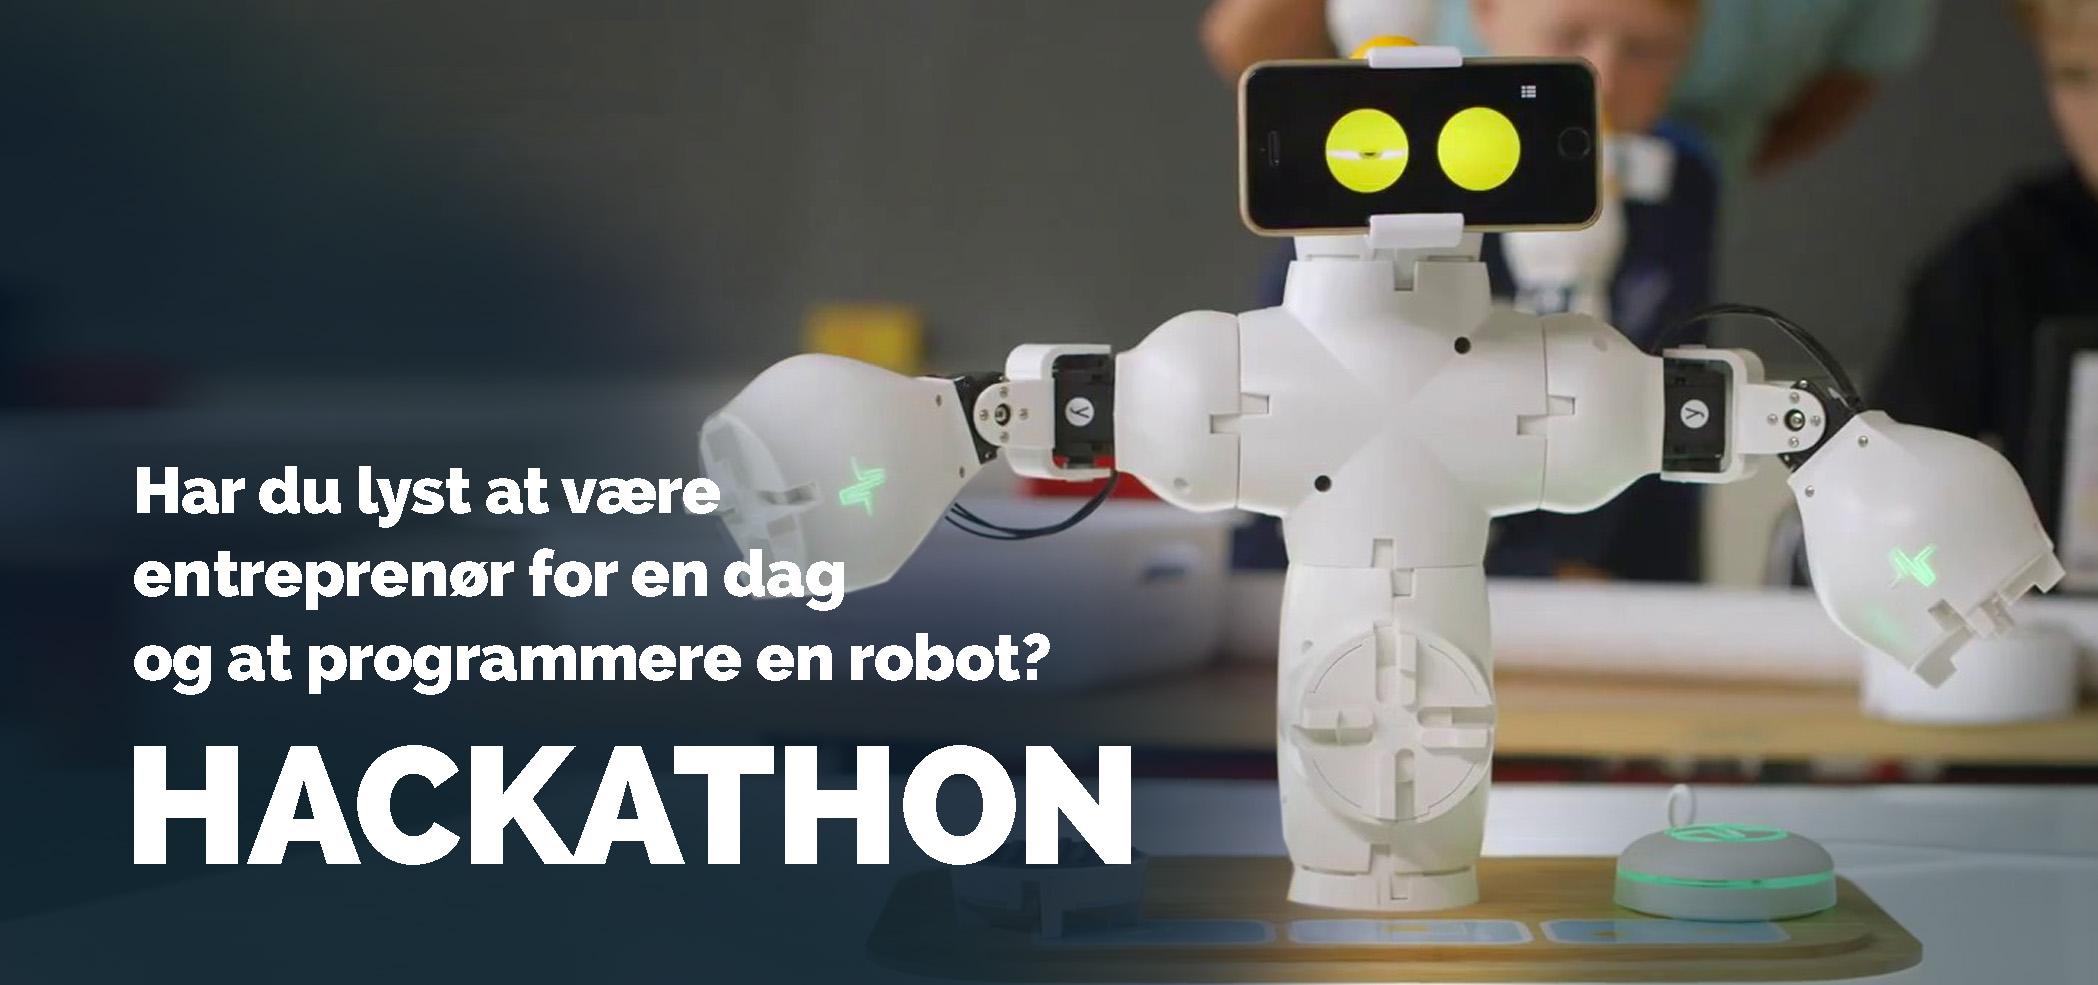 H5G robot hackathon 2